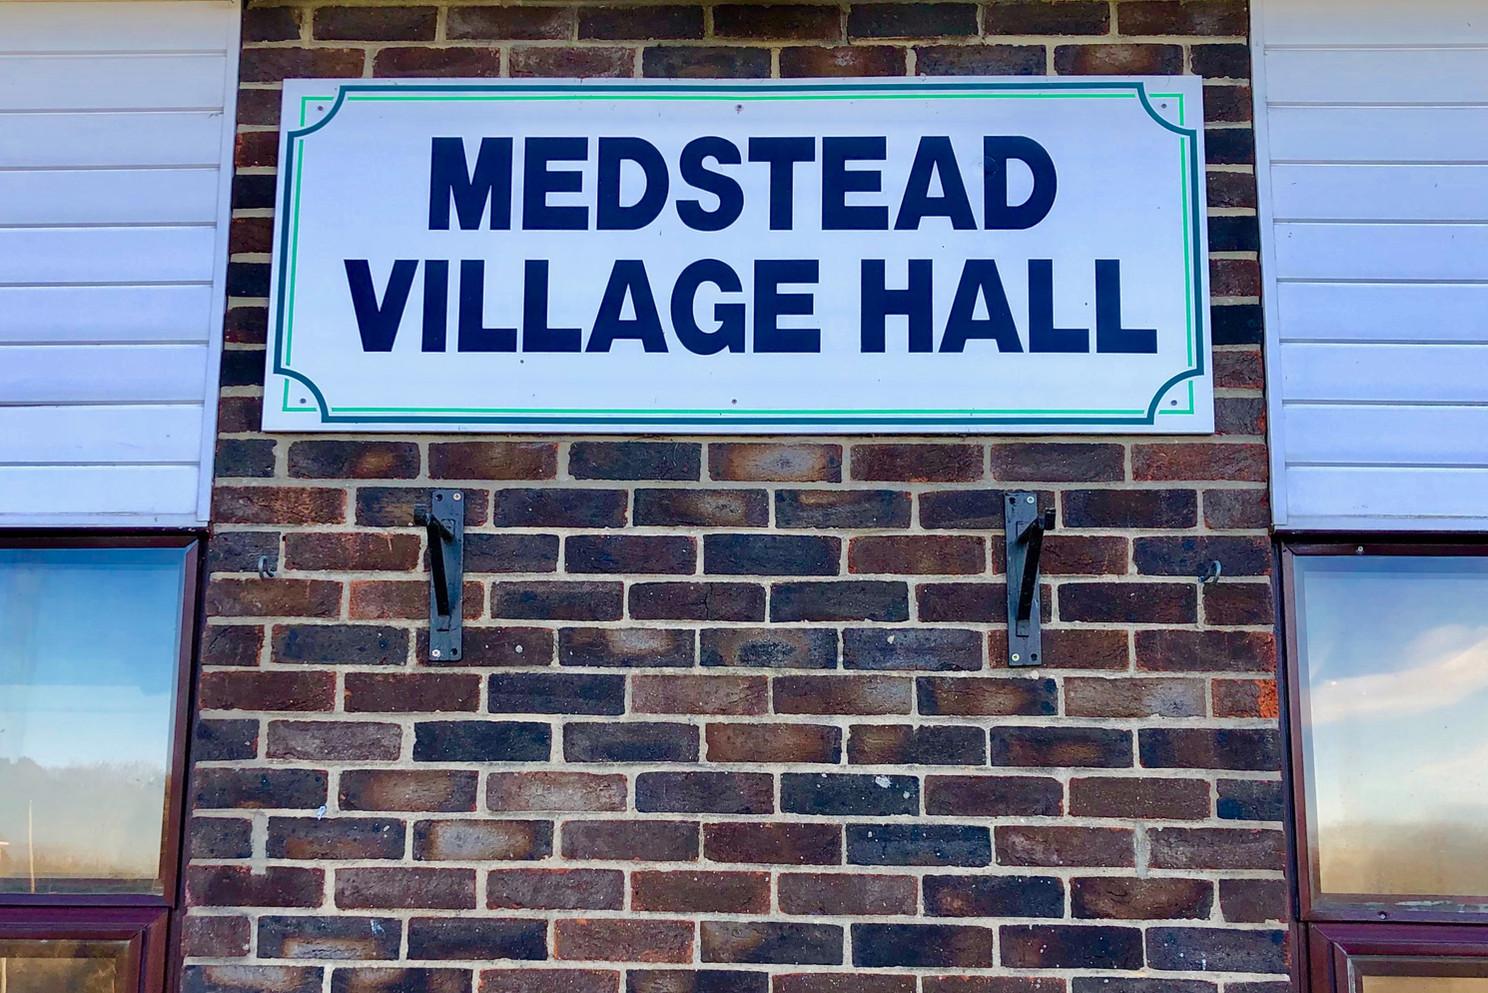 Medstead Village Hall